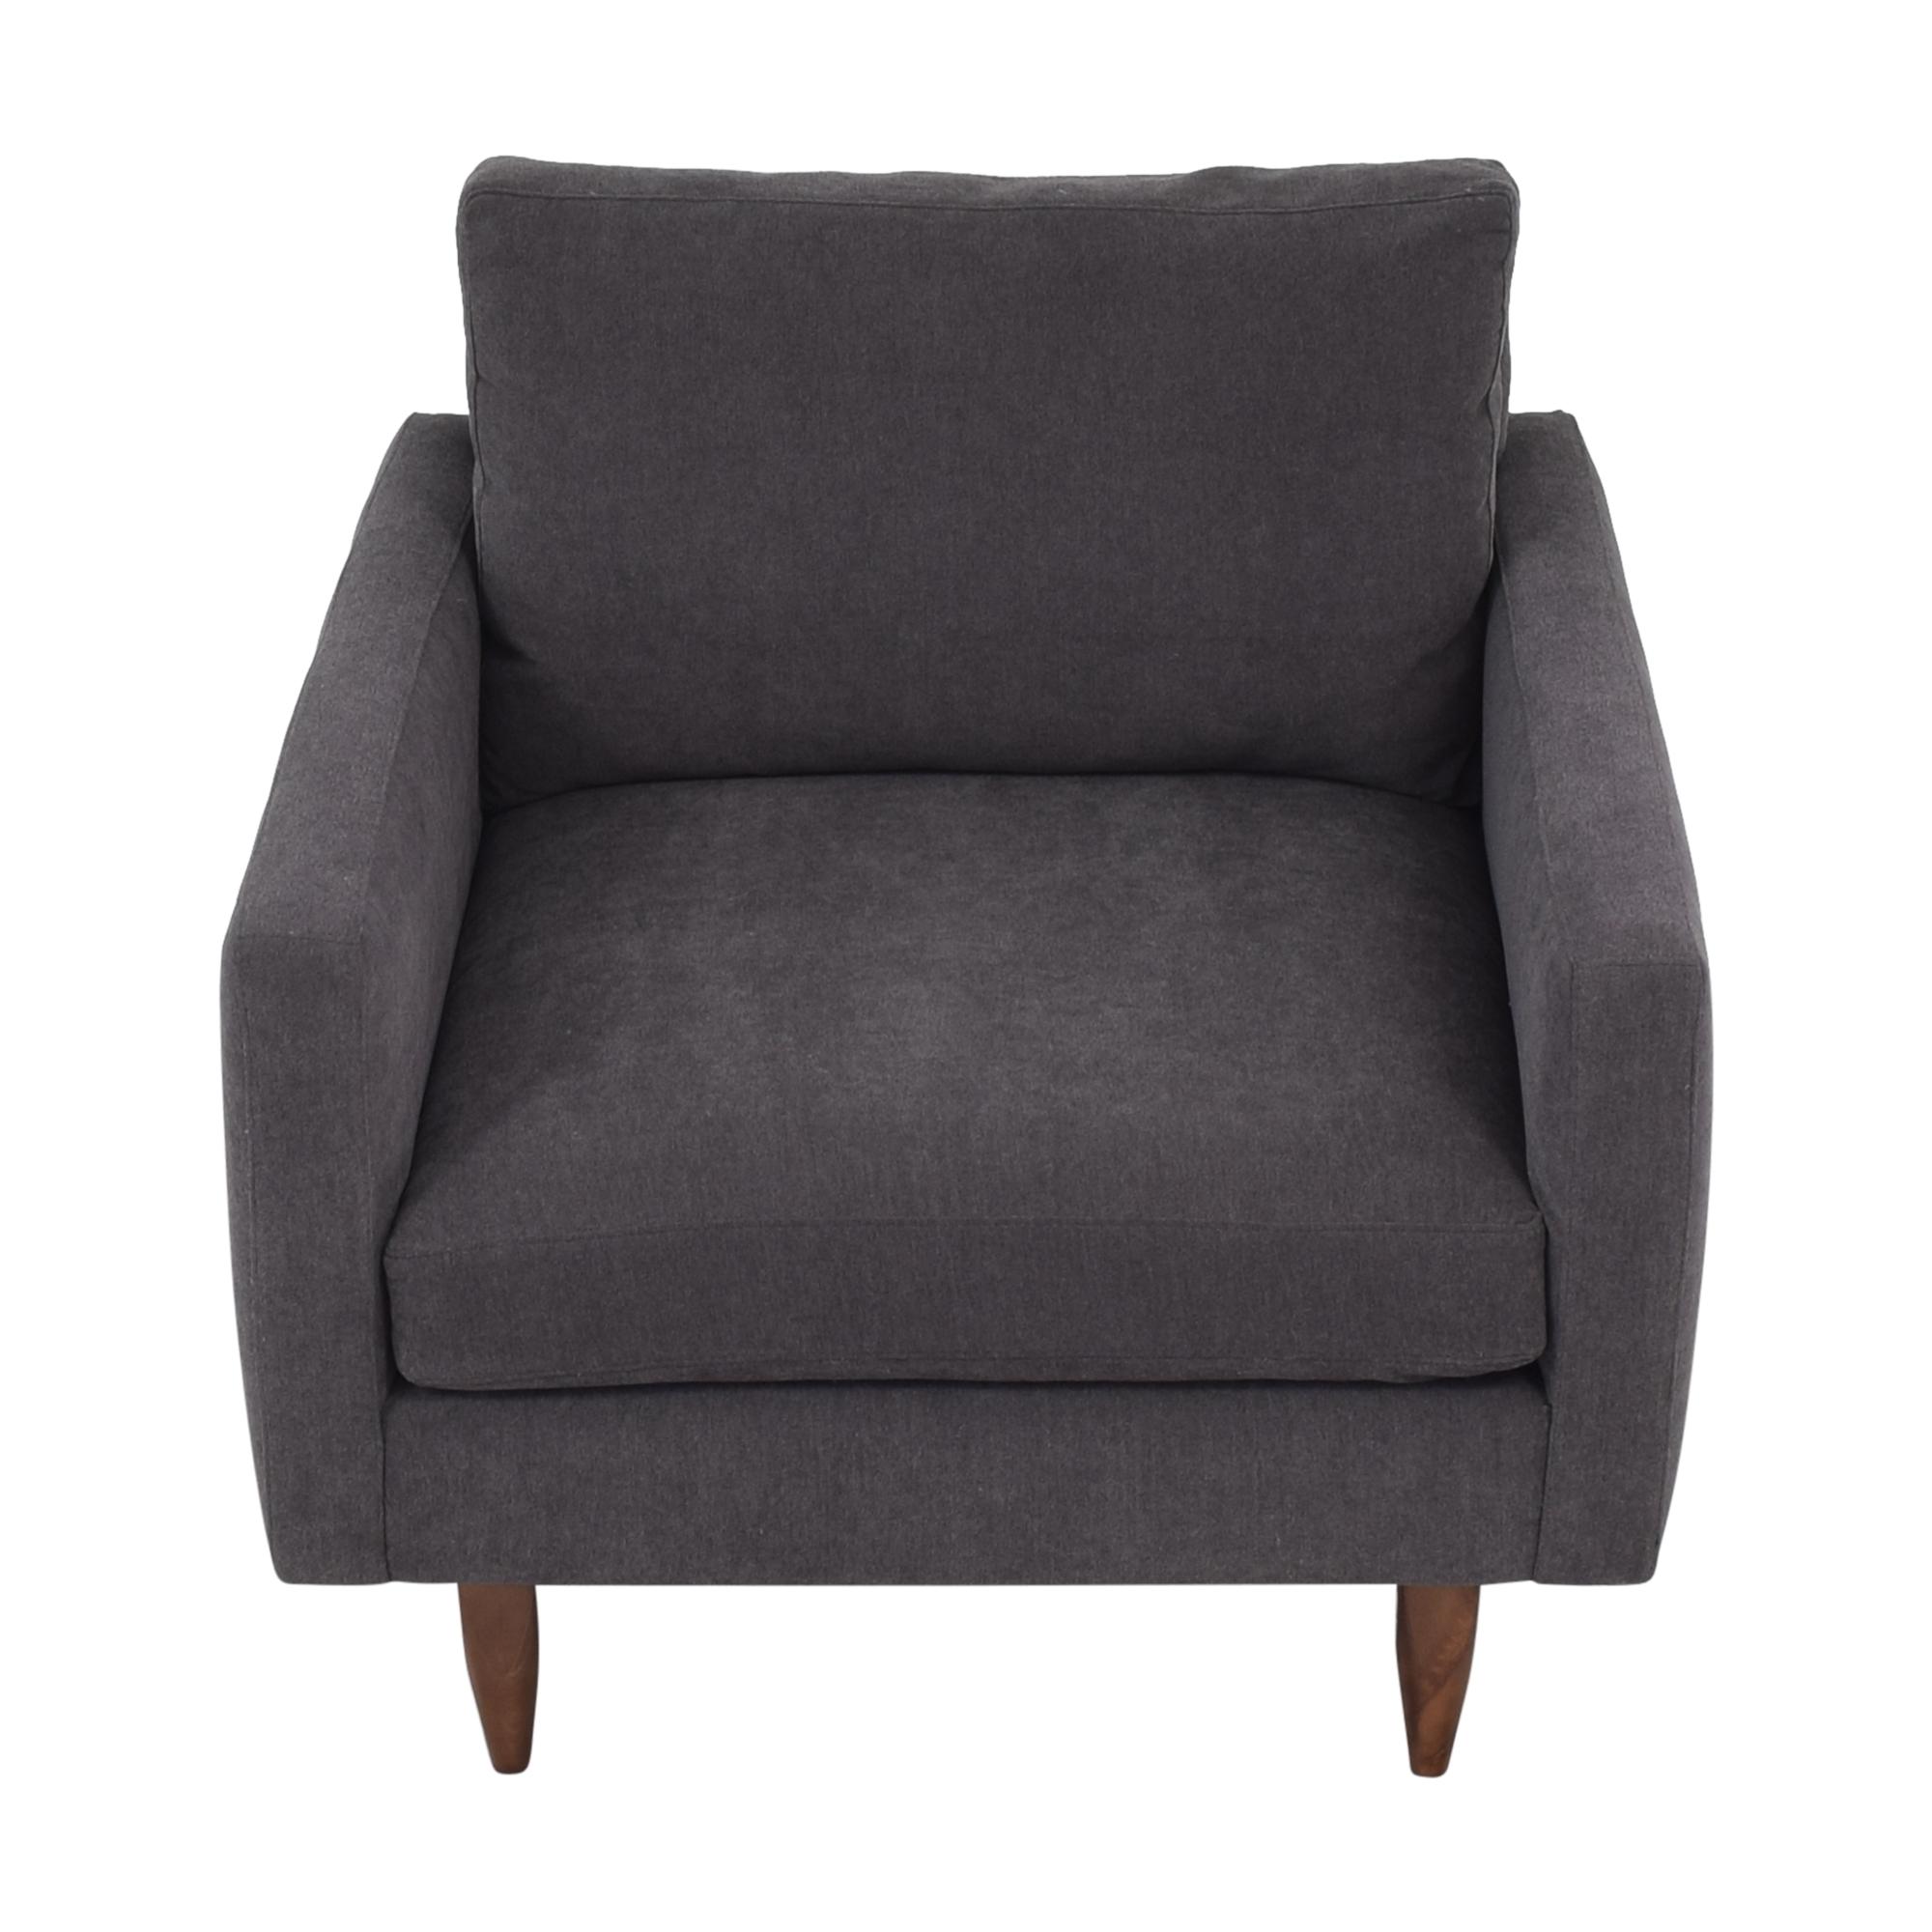 Room & Board Jasper Chair Room & Board